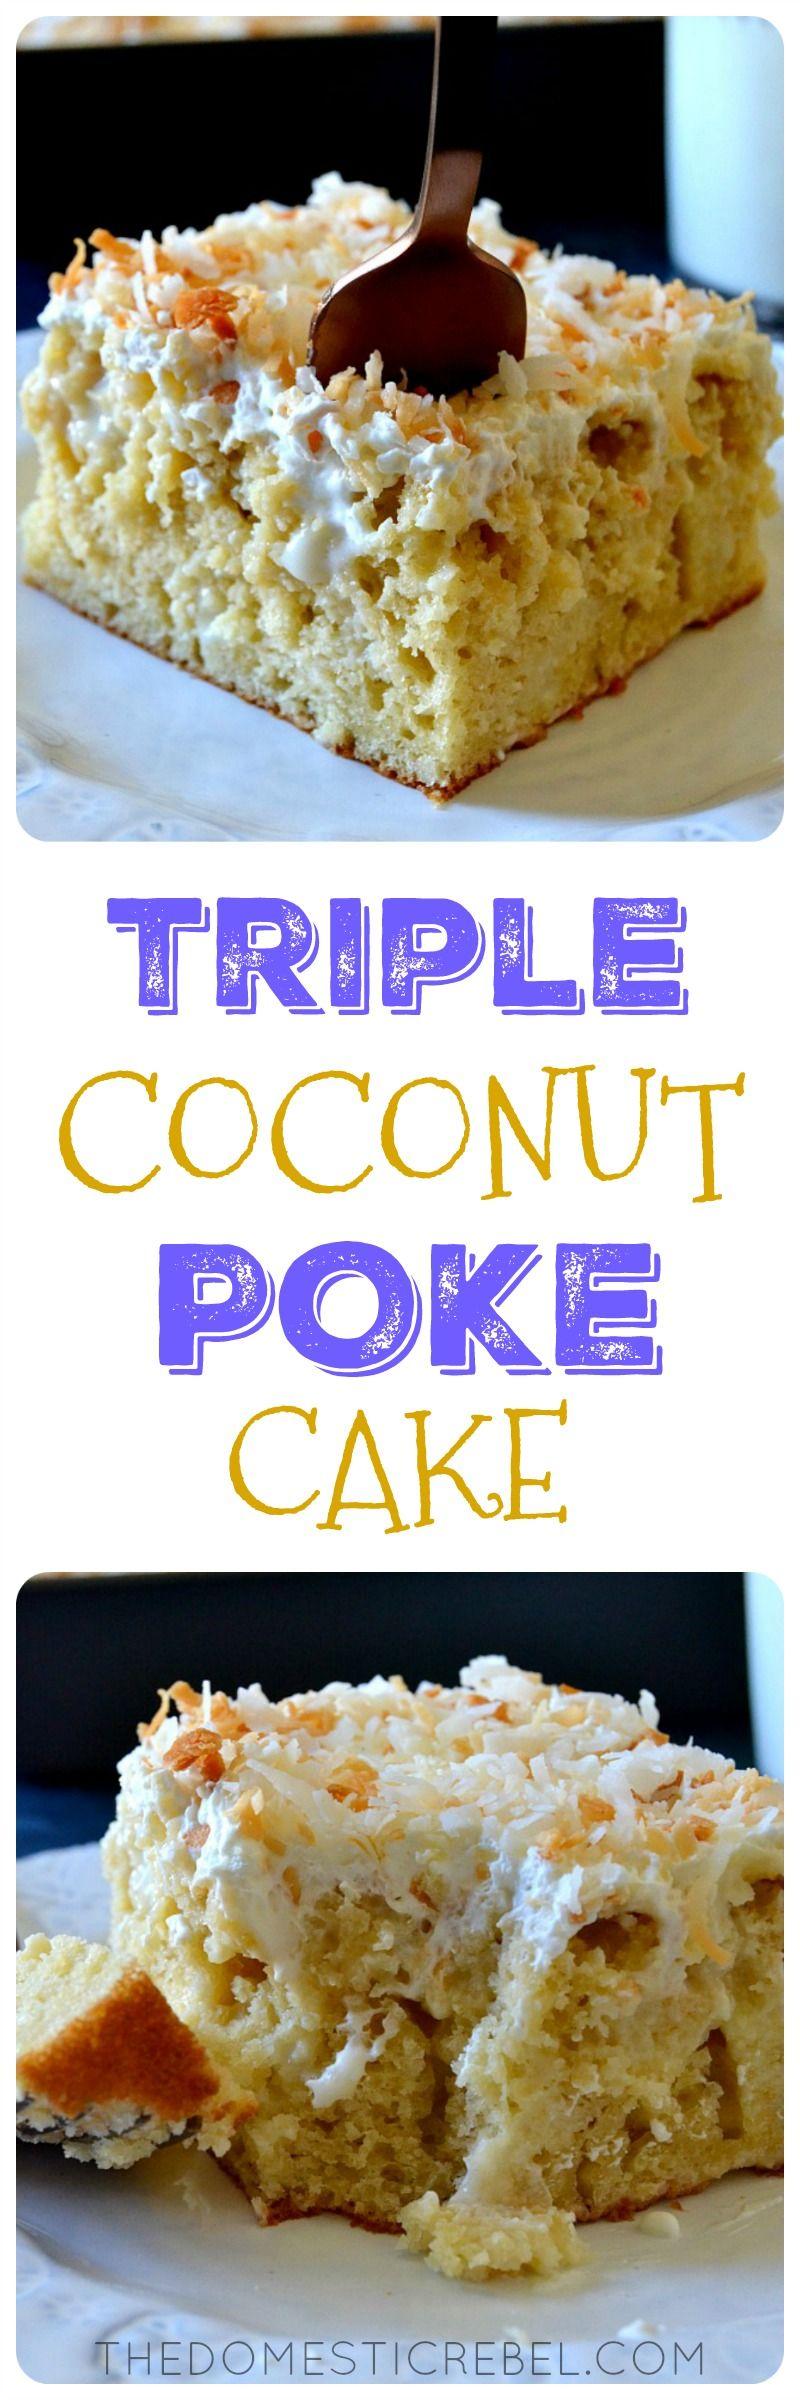 Triple Coconut Poke Cake Recipe Gentilly cake recipe